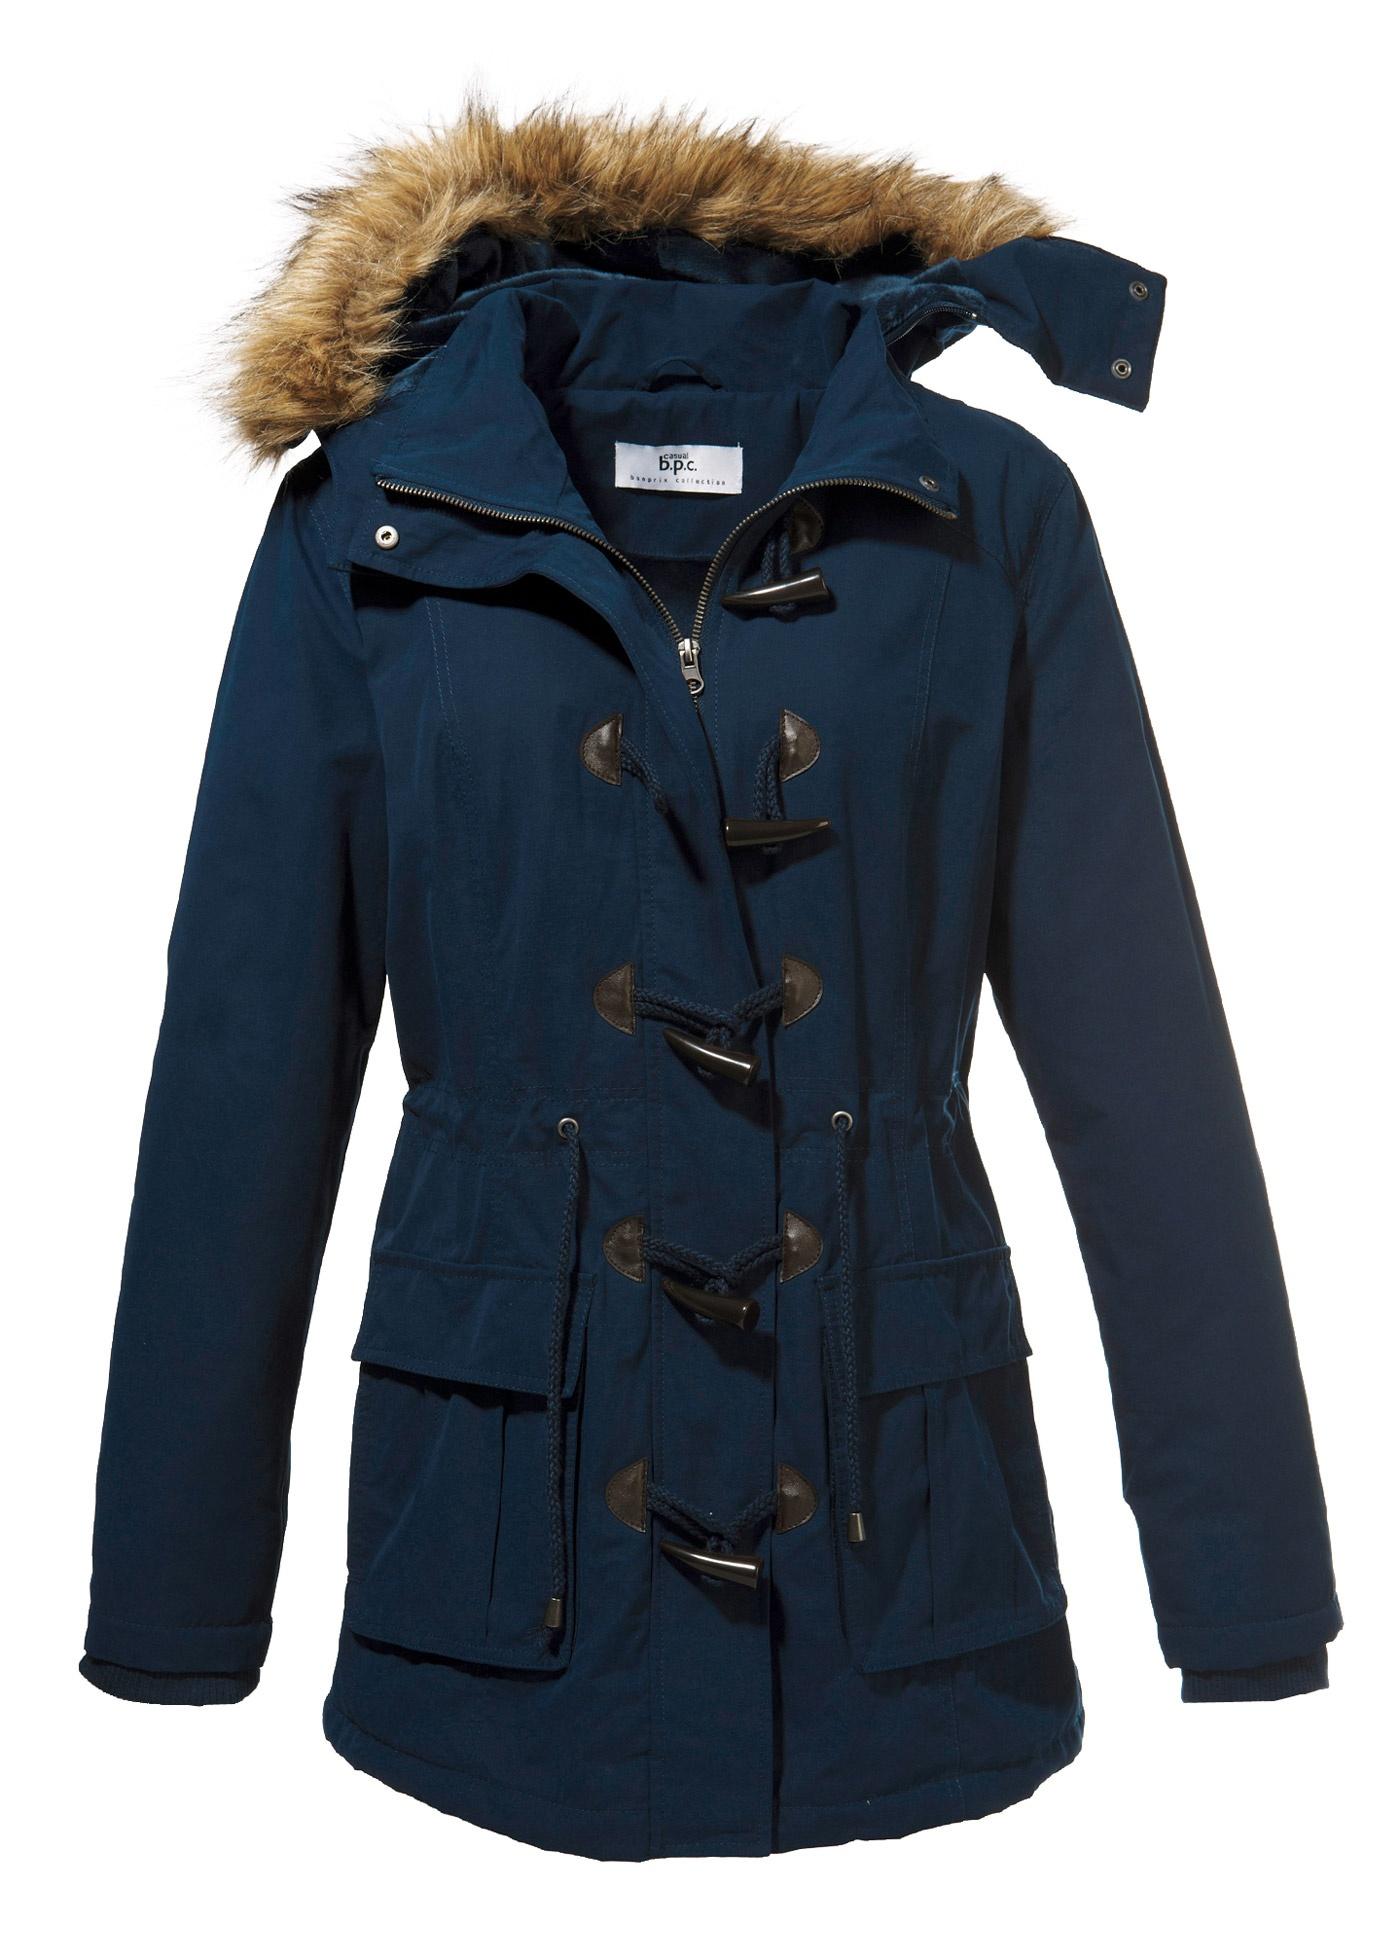 bergangsjacke gr 46 blau damen jacke damen parka mantel. Black Bedroom Furniture Sets. Home Design Ideas